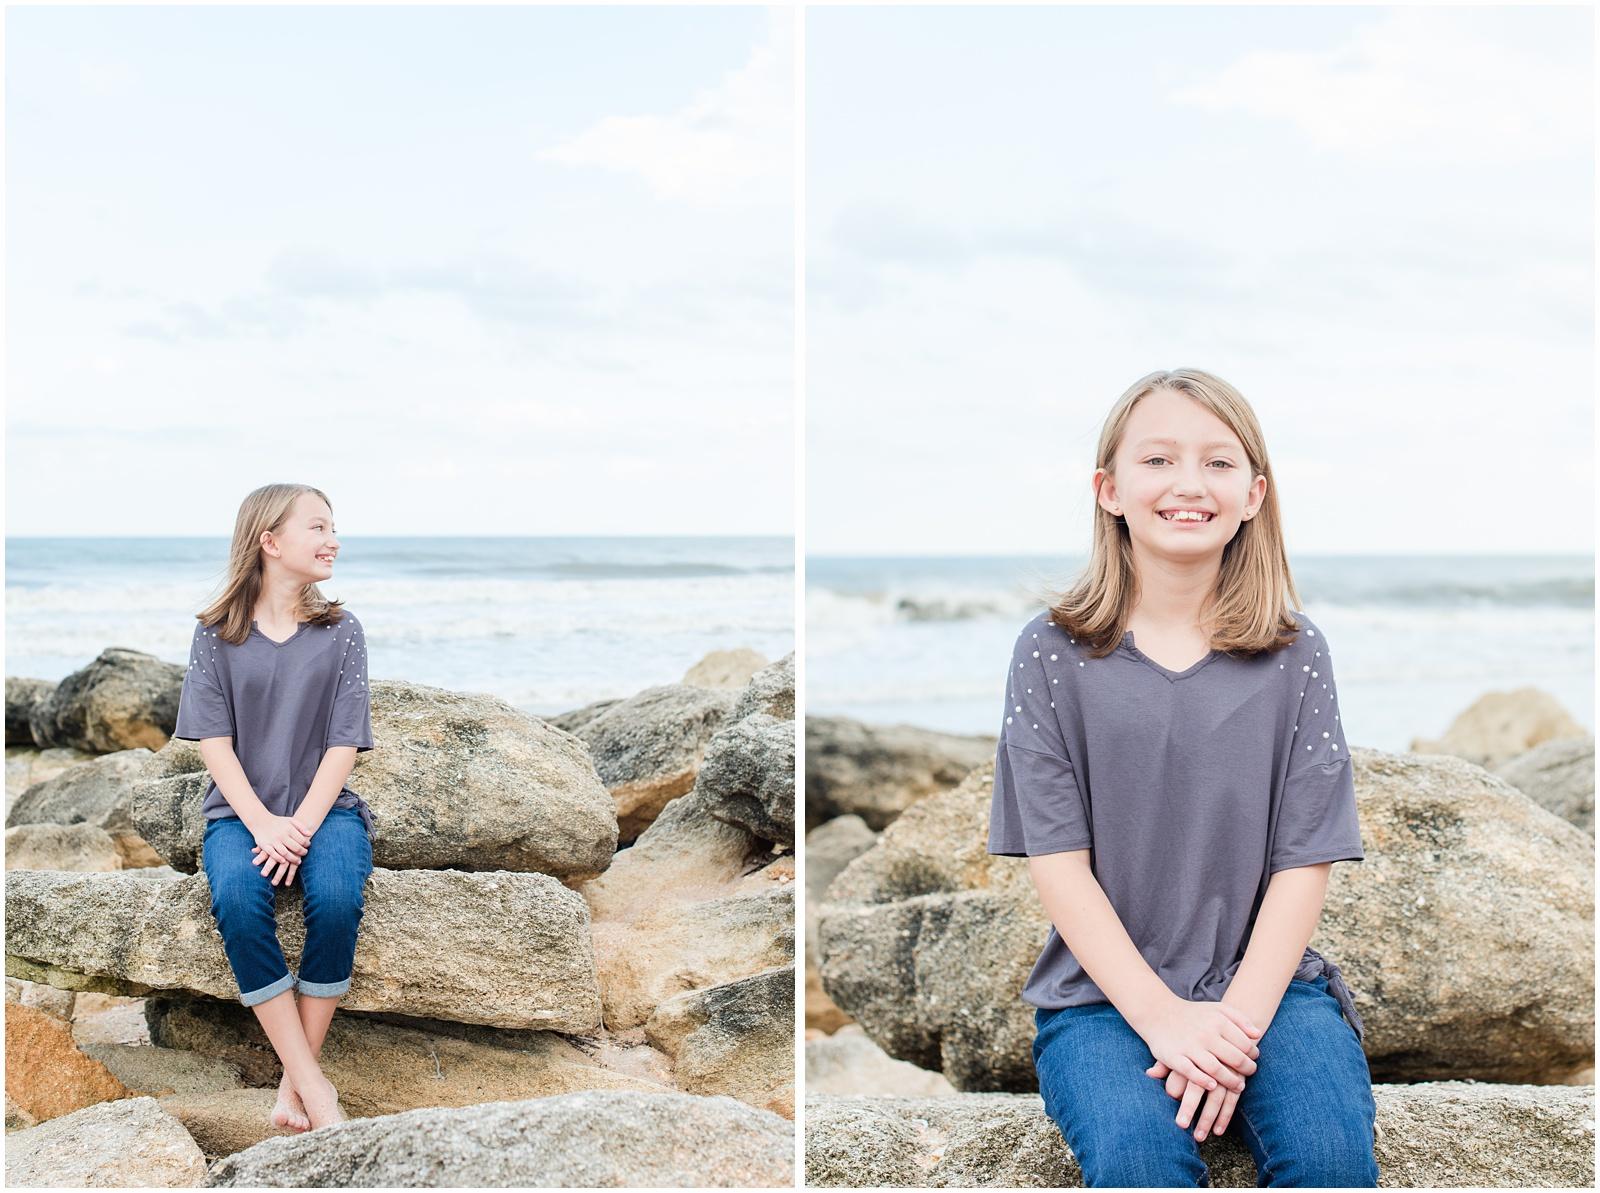 Washington Oaks_Garden_State Park_Beach_Family_Portraits_12.jpg